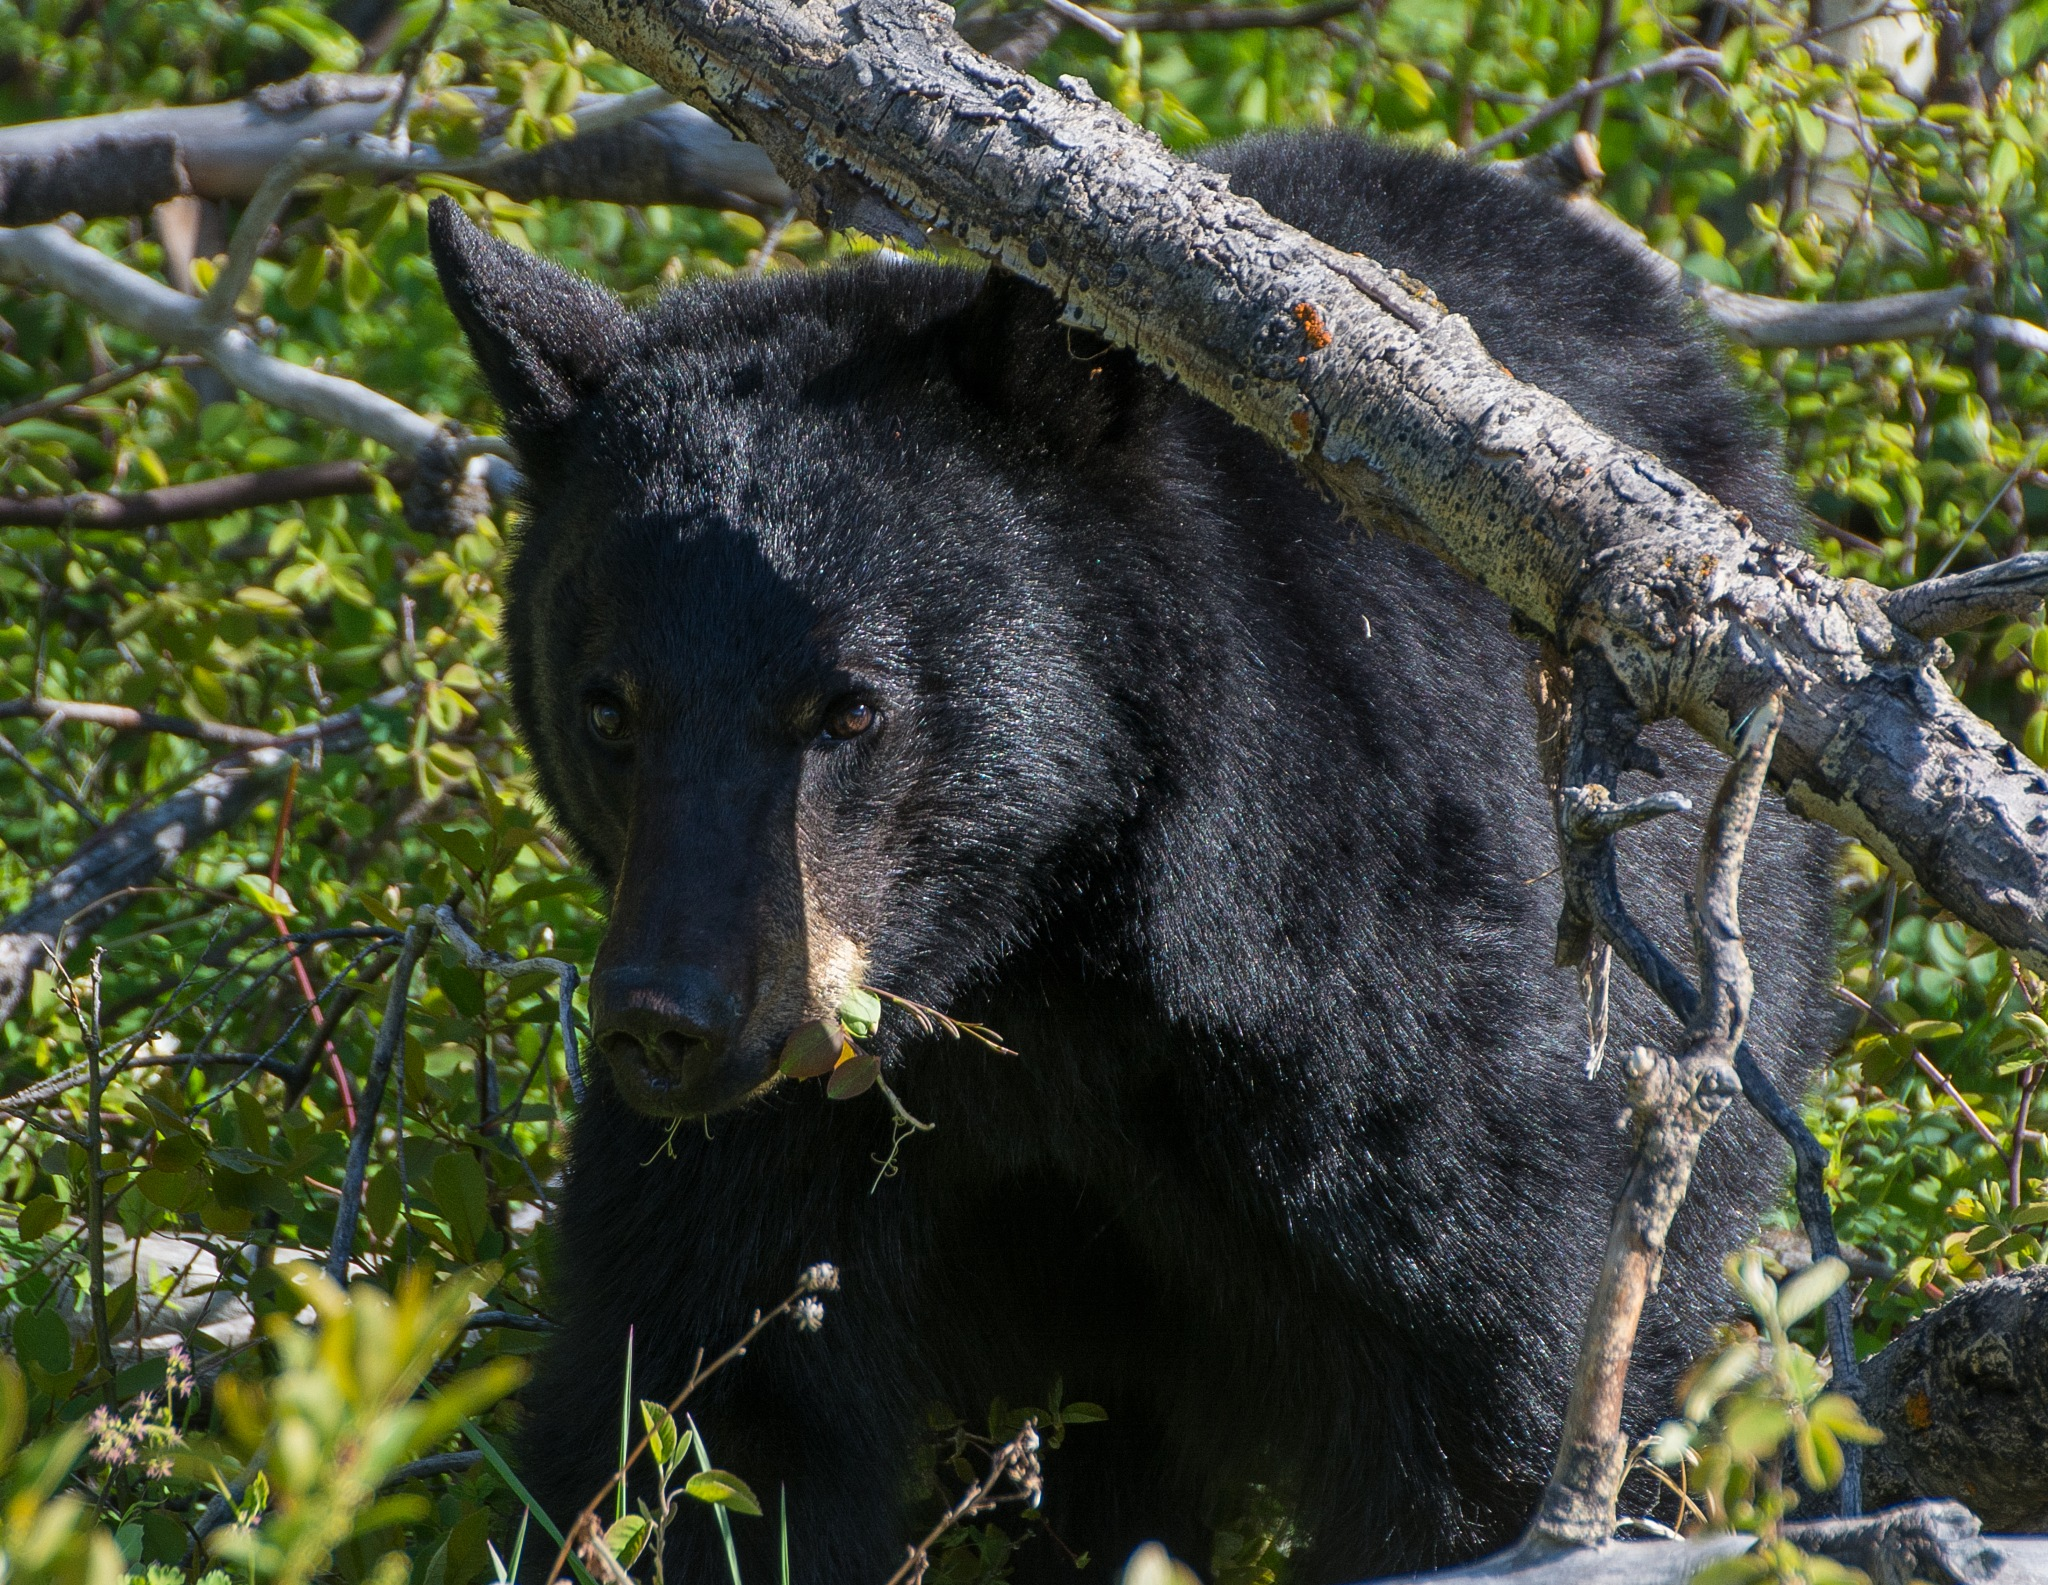 Black bear 1 by SteveRedmond